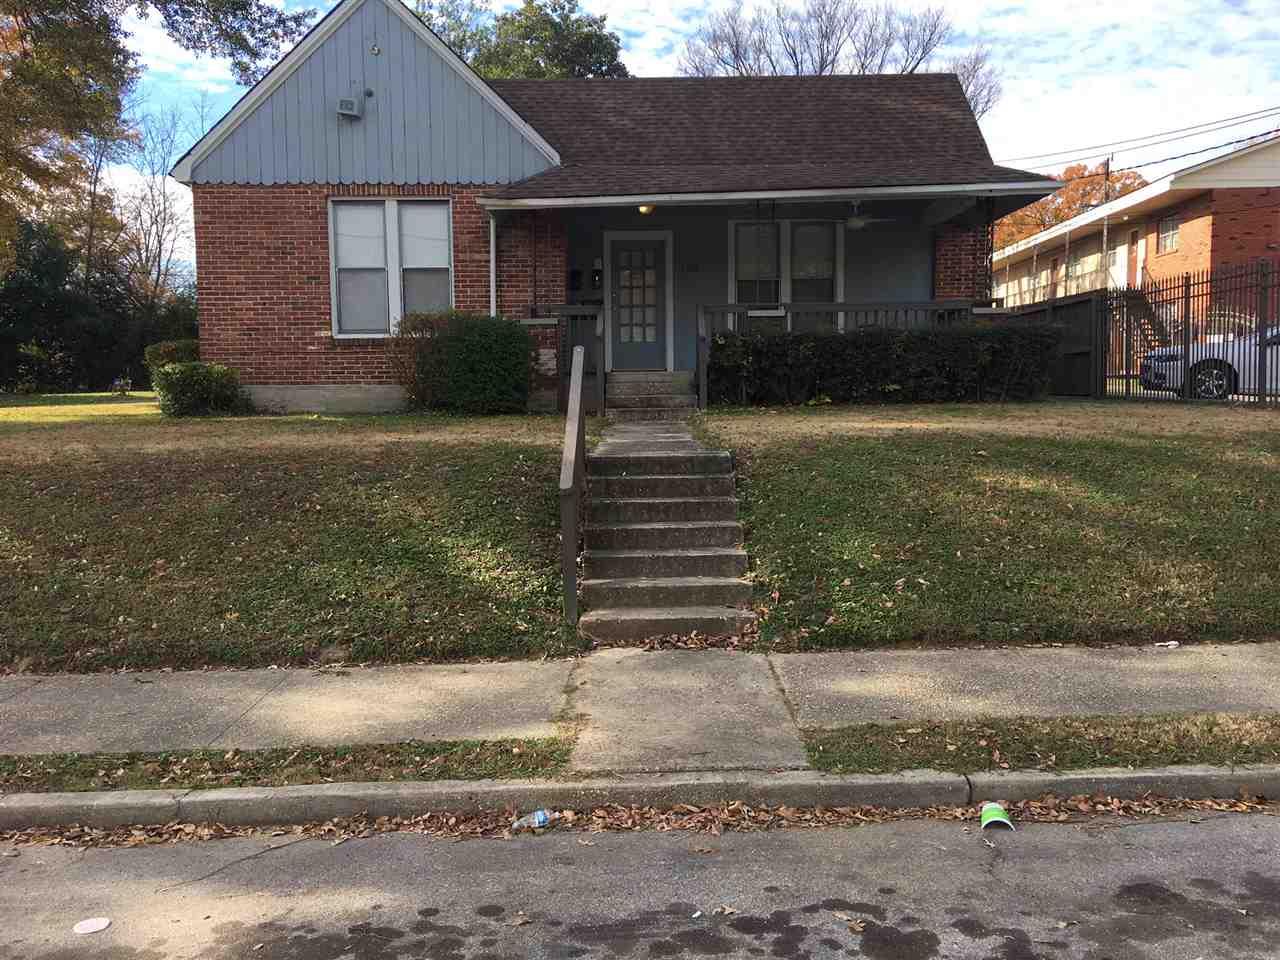 165 N Merton Memphis, TN 38112 - MLS #: 10028583